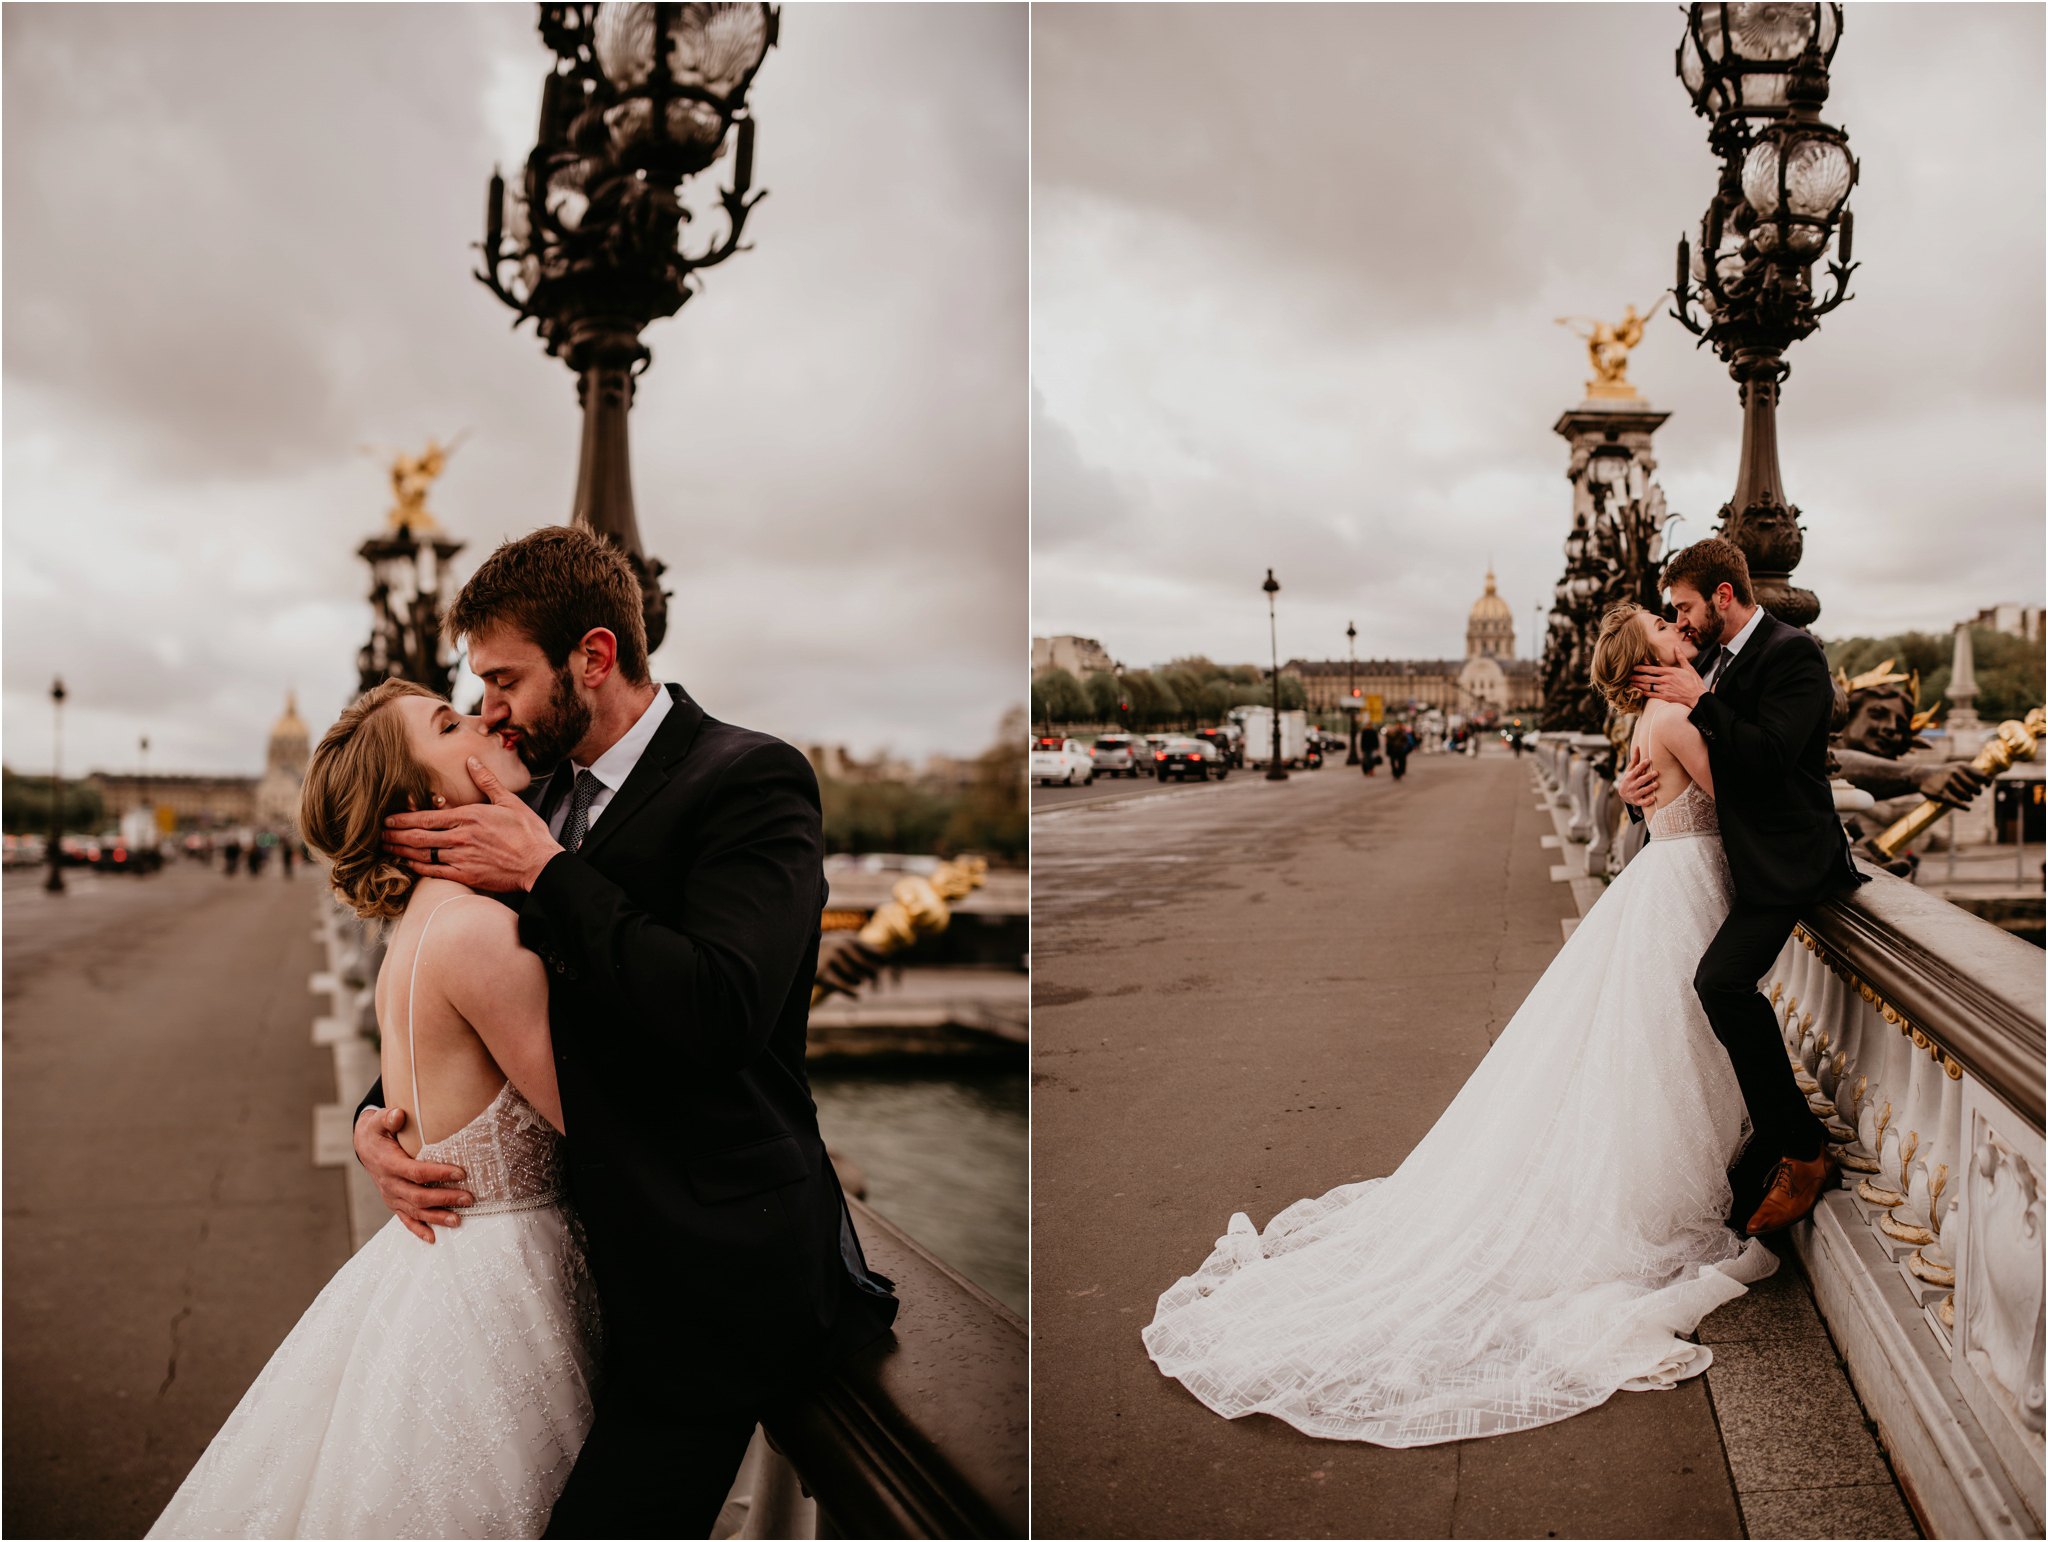 miranda-and-jared-paris-elopement-destination-wedding-photographer-083.jpg